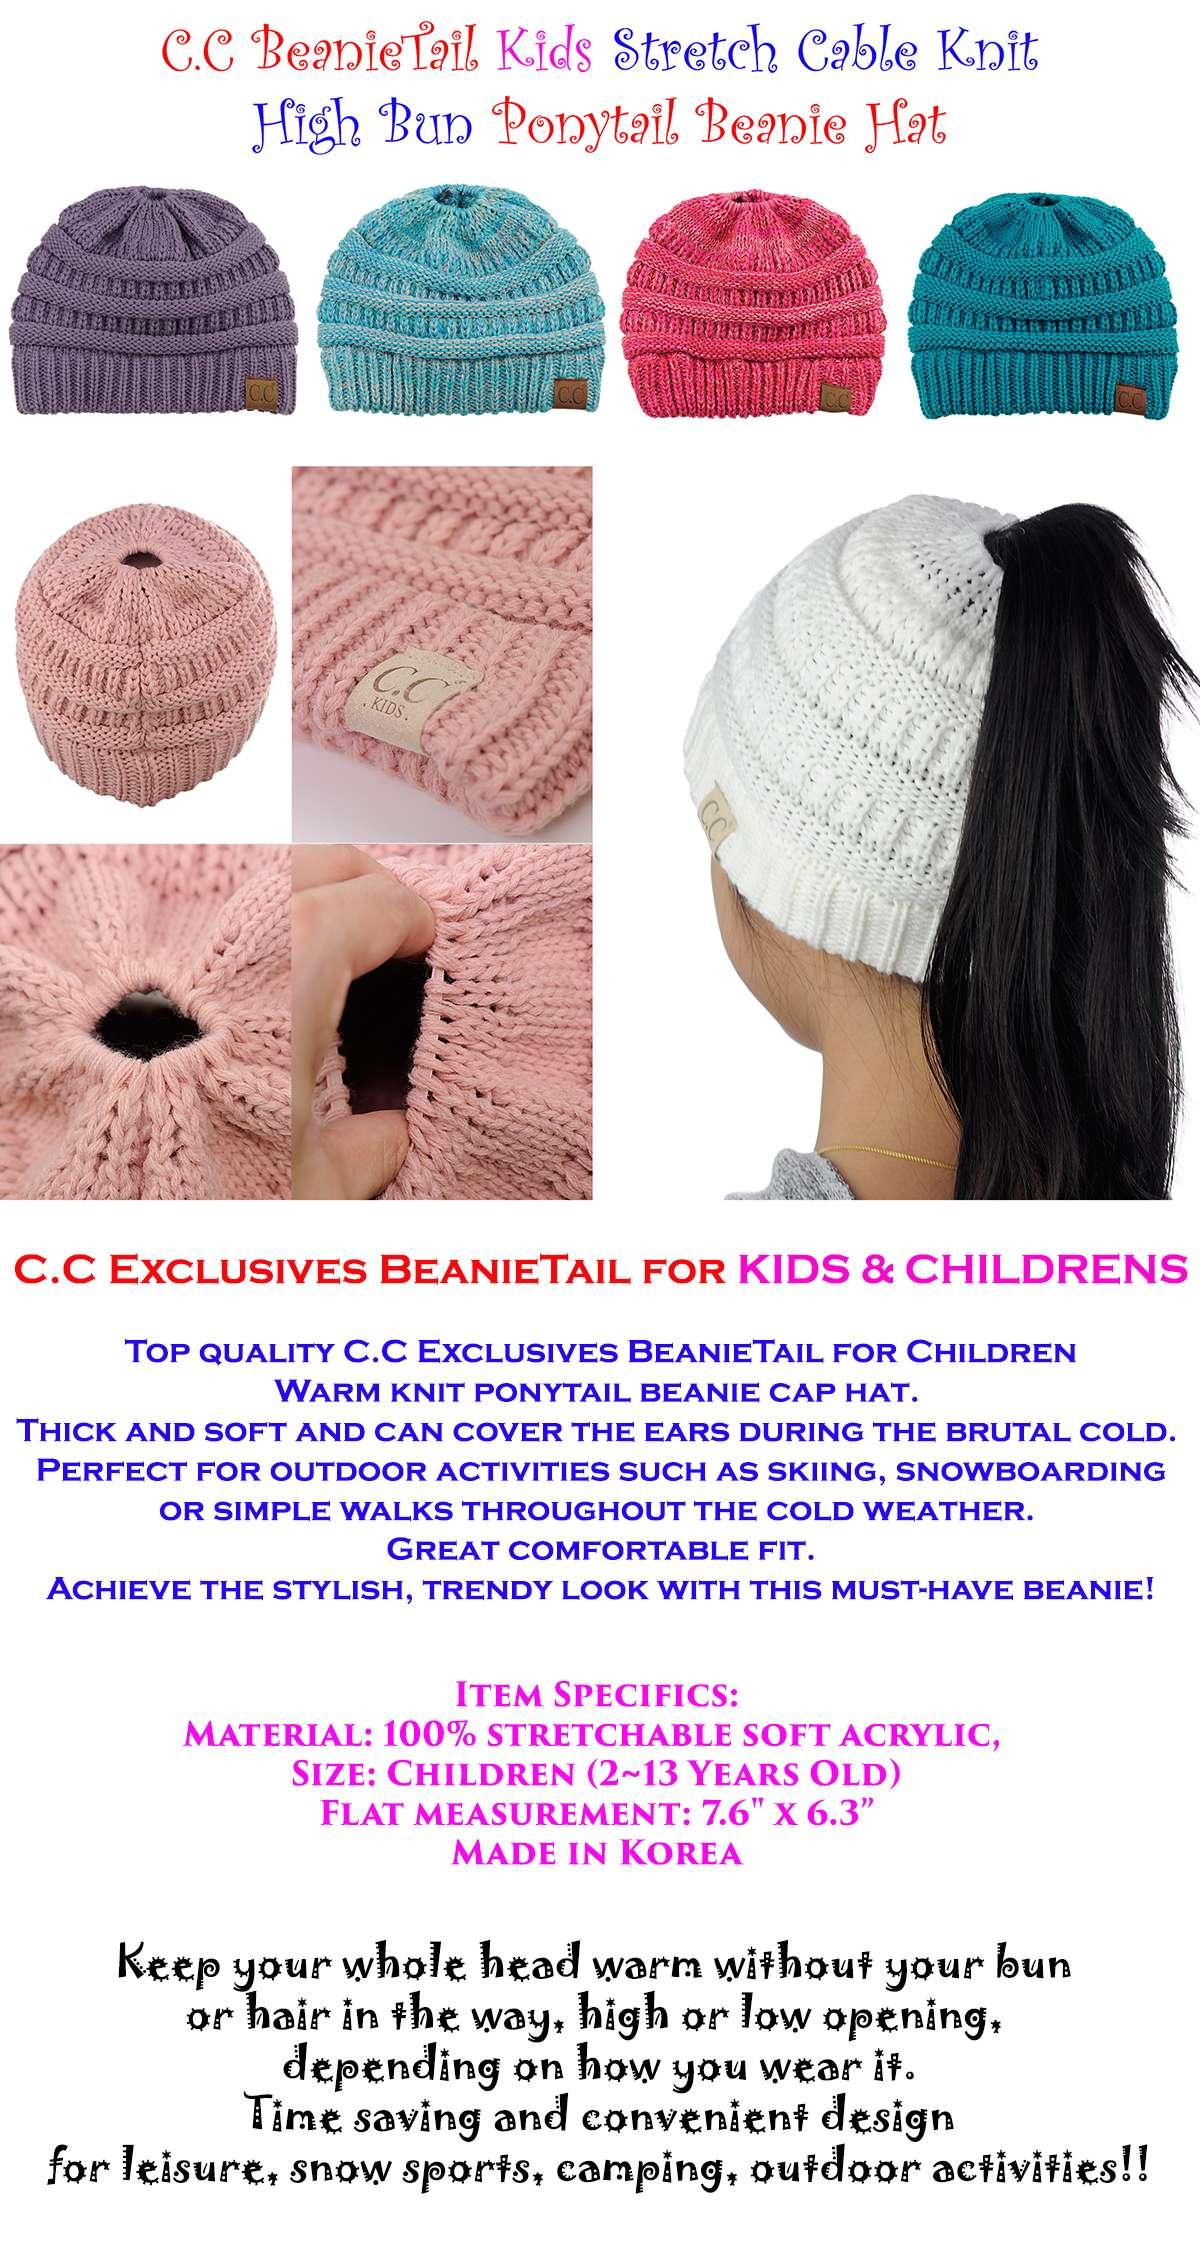 Kids CC Ponytail Beanie Children Soft Cable Knit Messy High Bun CC